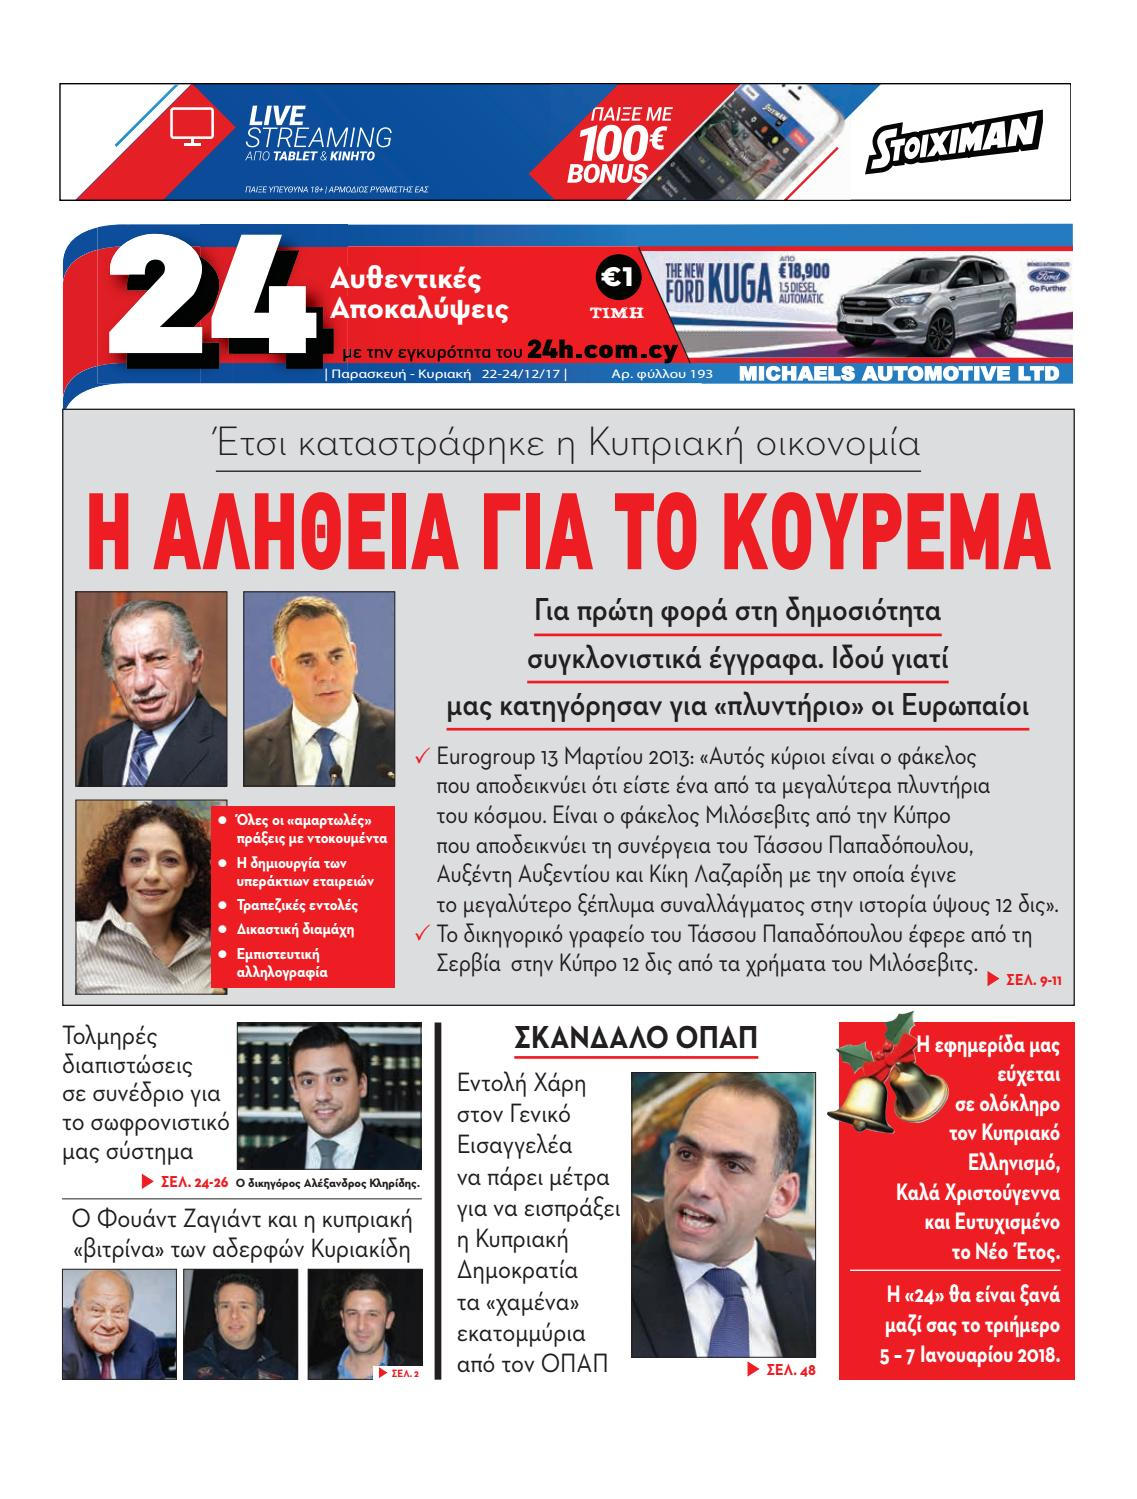 dde7f93f041 Εφημερίδα 24 - Φύλλο 193 - 22 Δεκεμβρίου 2017 by Newspaper 24 - issuu